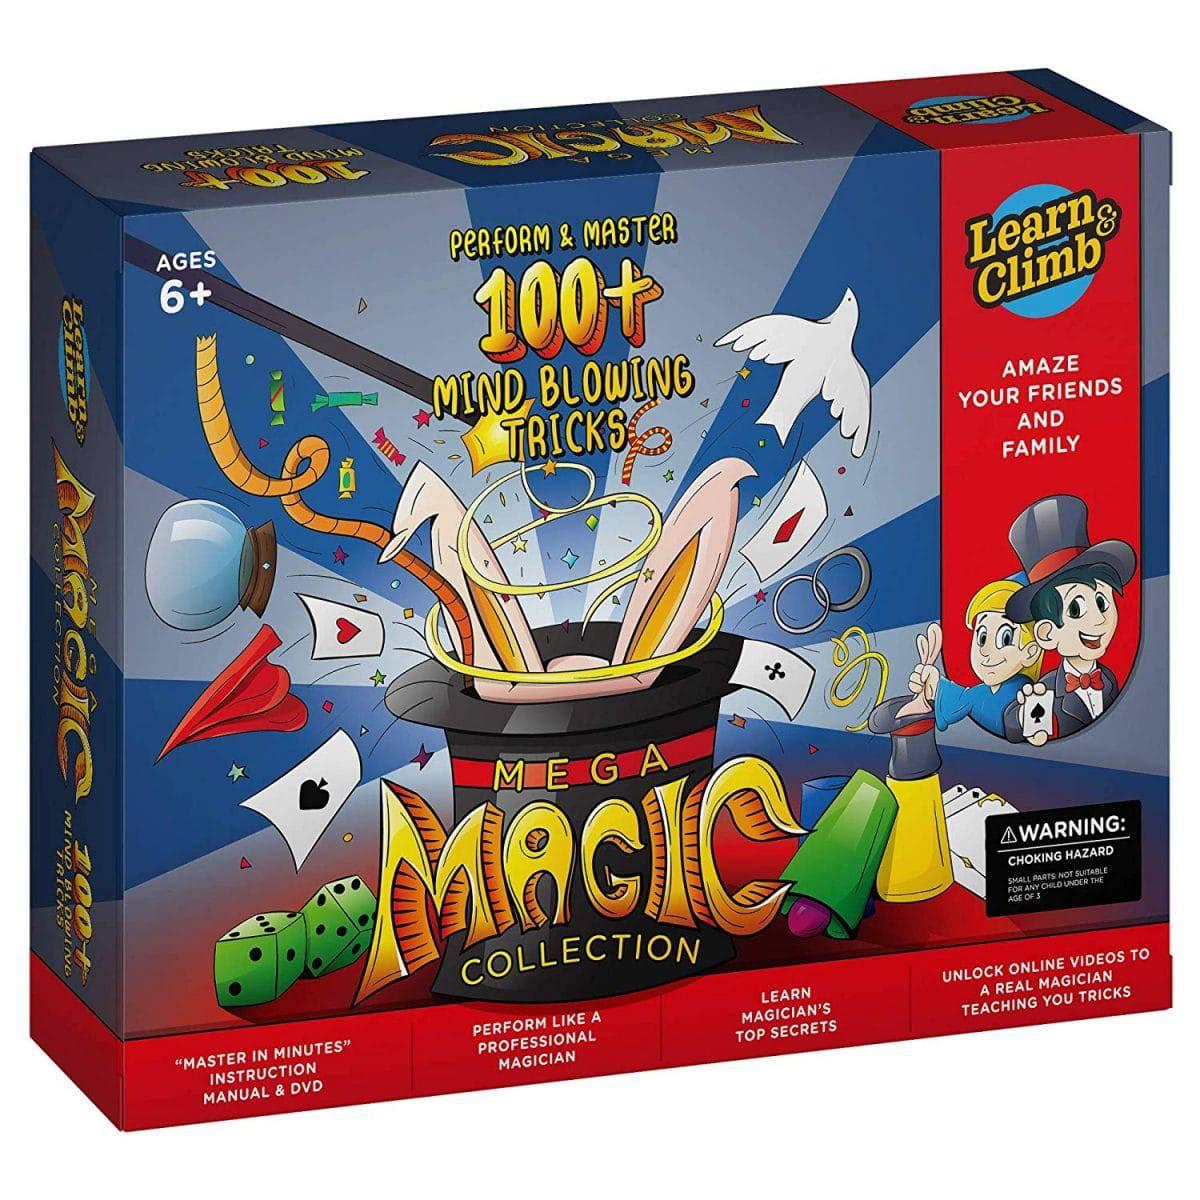 MAGIC SPONGE RABBITS /& INSTRUCTIONS BY MAGIC MAKERS TRICKS VANISH REAPPEAR MULTI